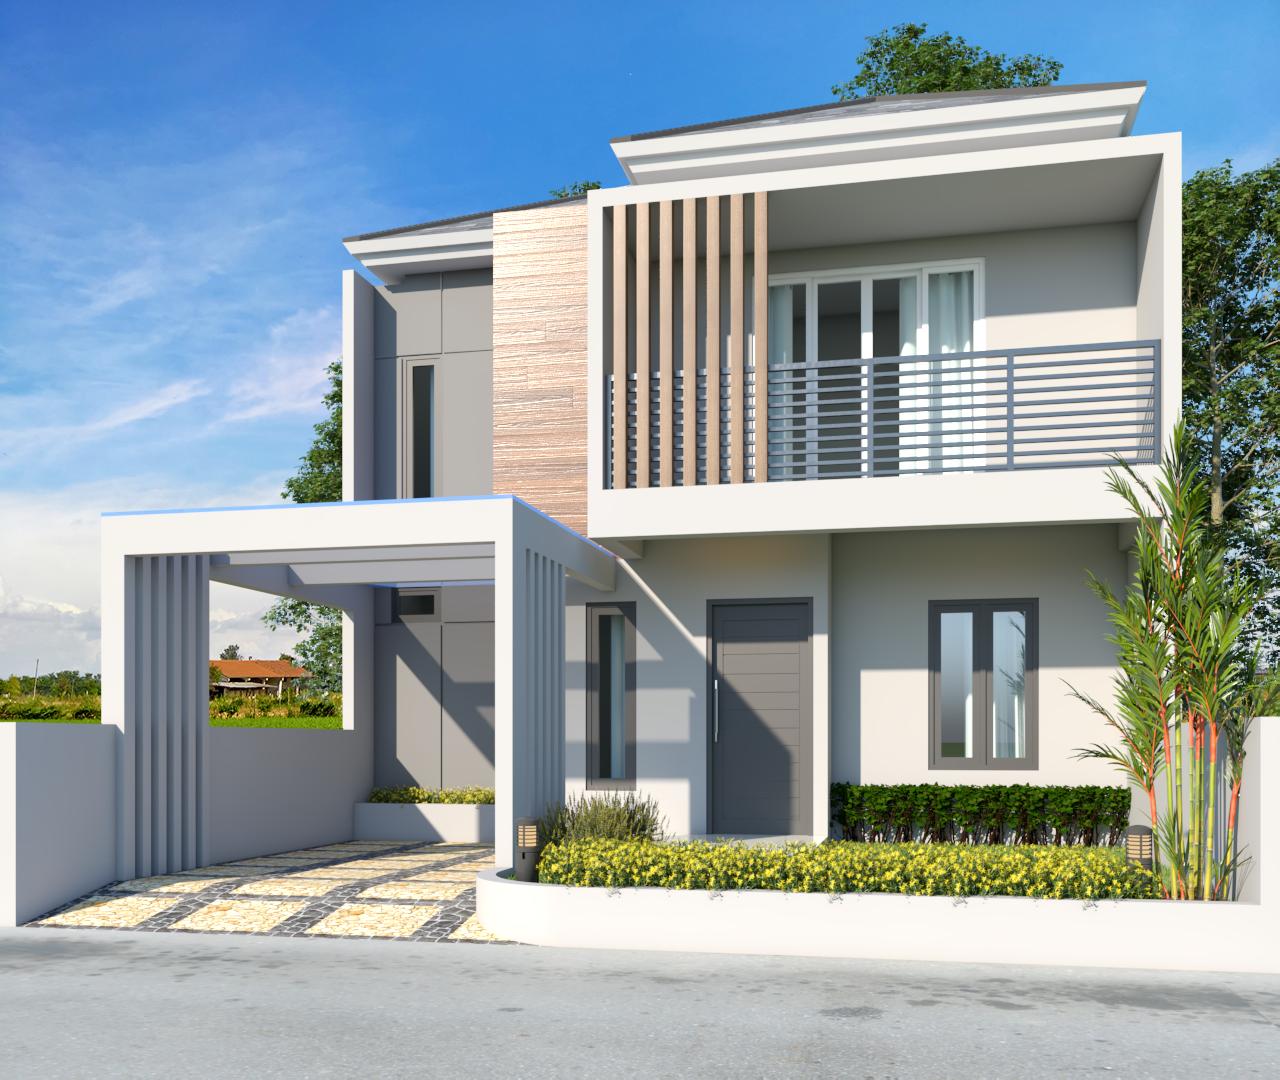 5.Denoiser - Desain Rumah Minimalis 2 Lantai